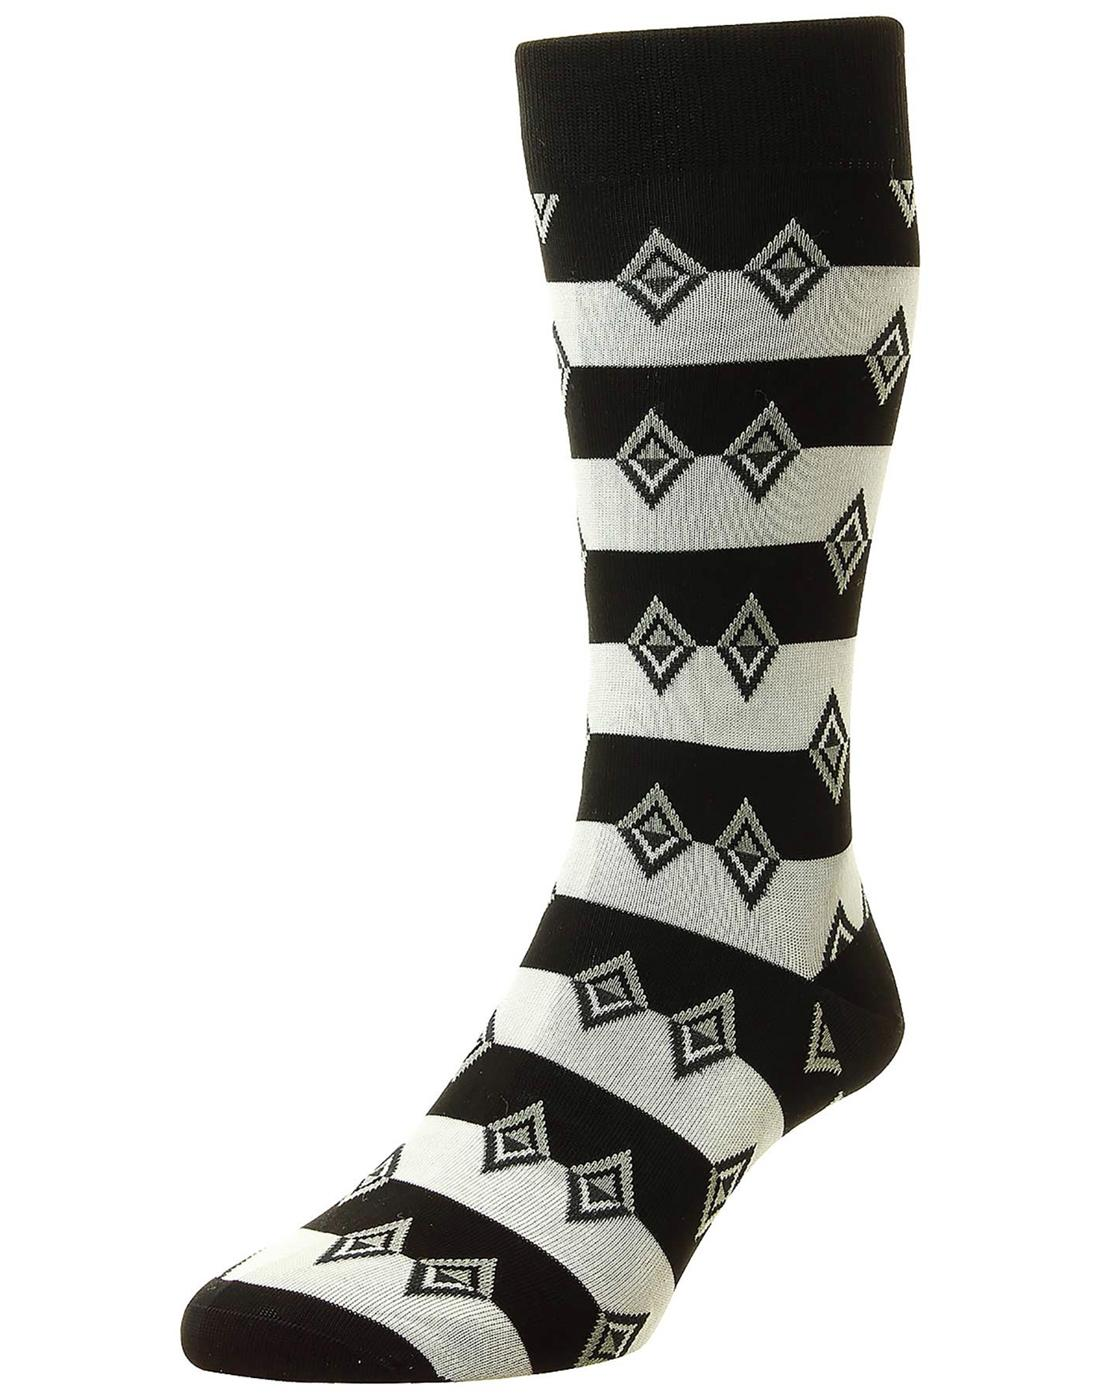 + Acapulco PANTHERELLA Retro Aztec Diamond Socks B